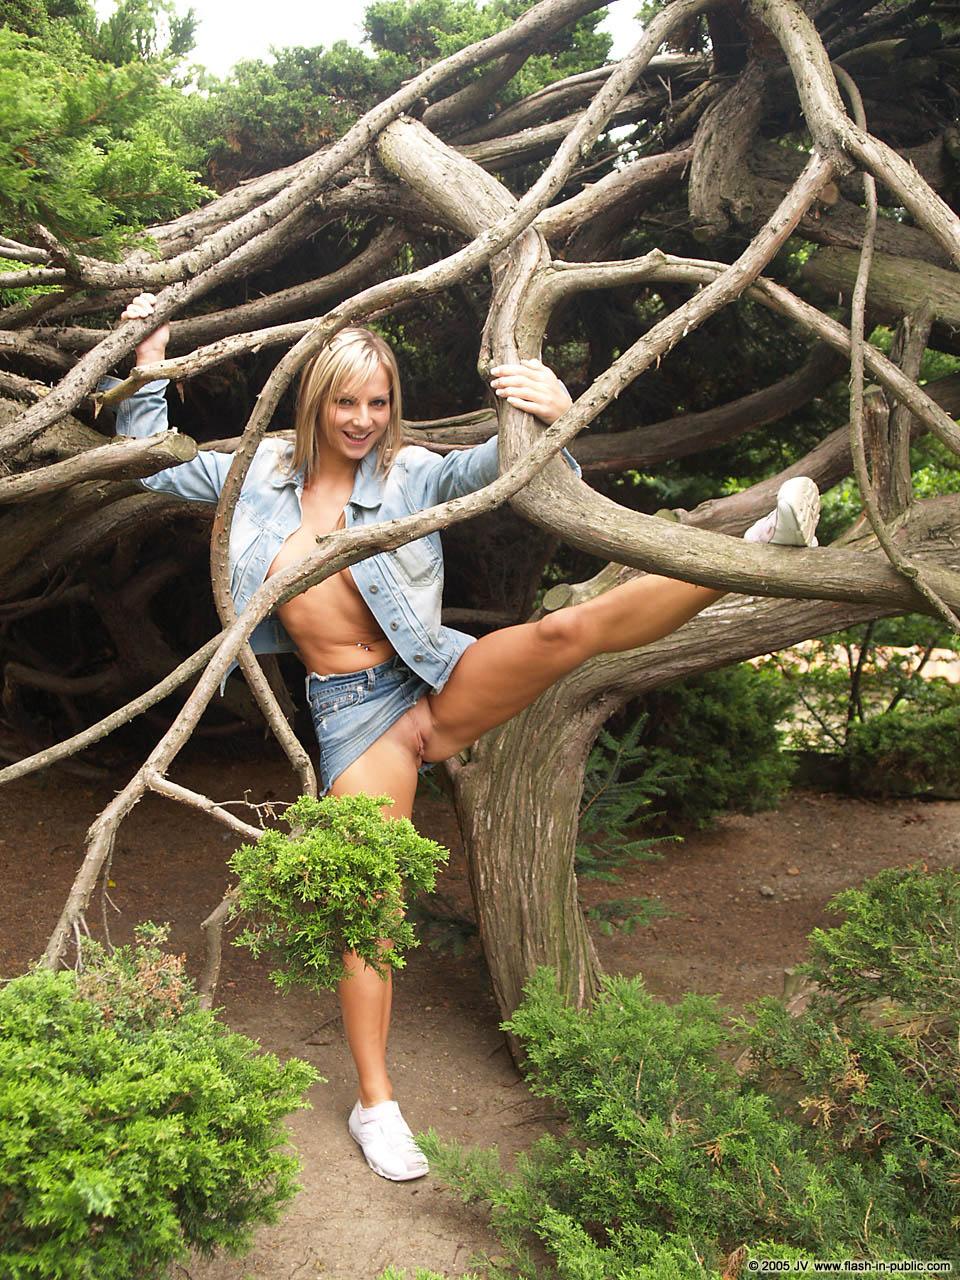 vendula-bednarova-jeans-miniskirt-flash-in-public-19